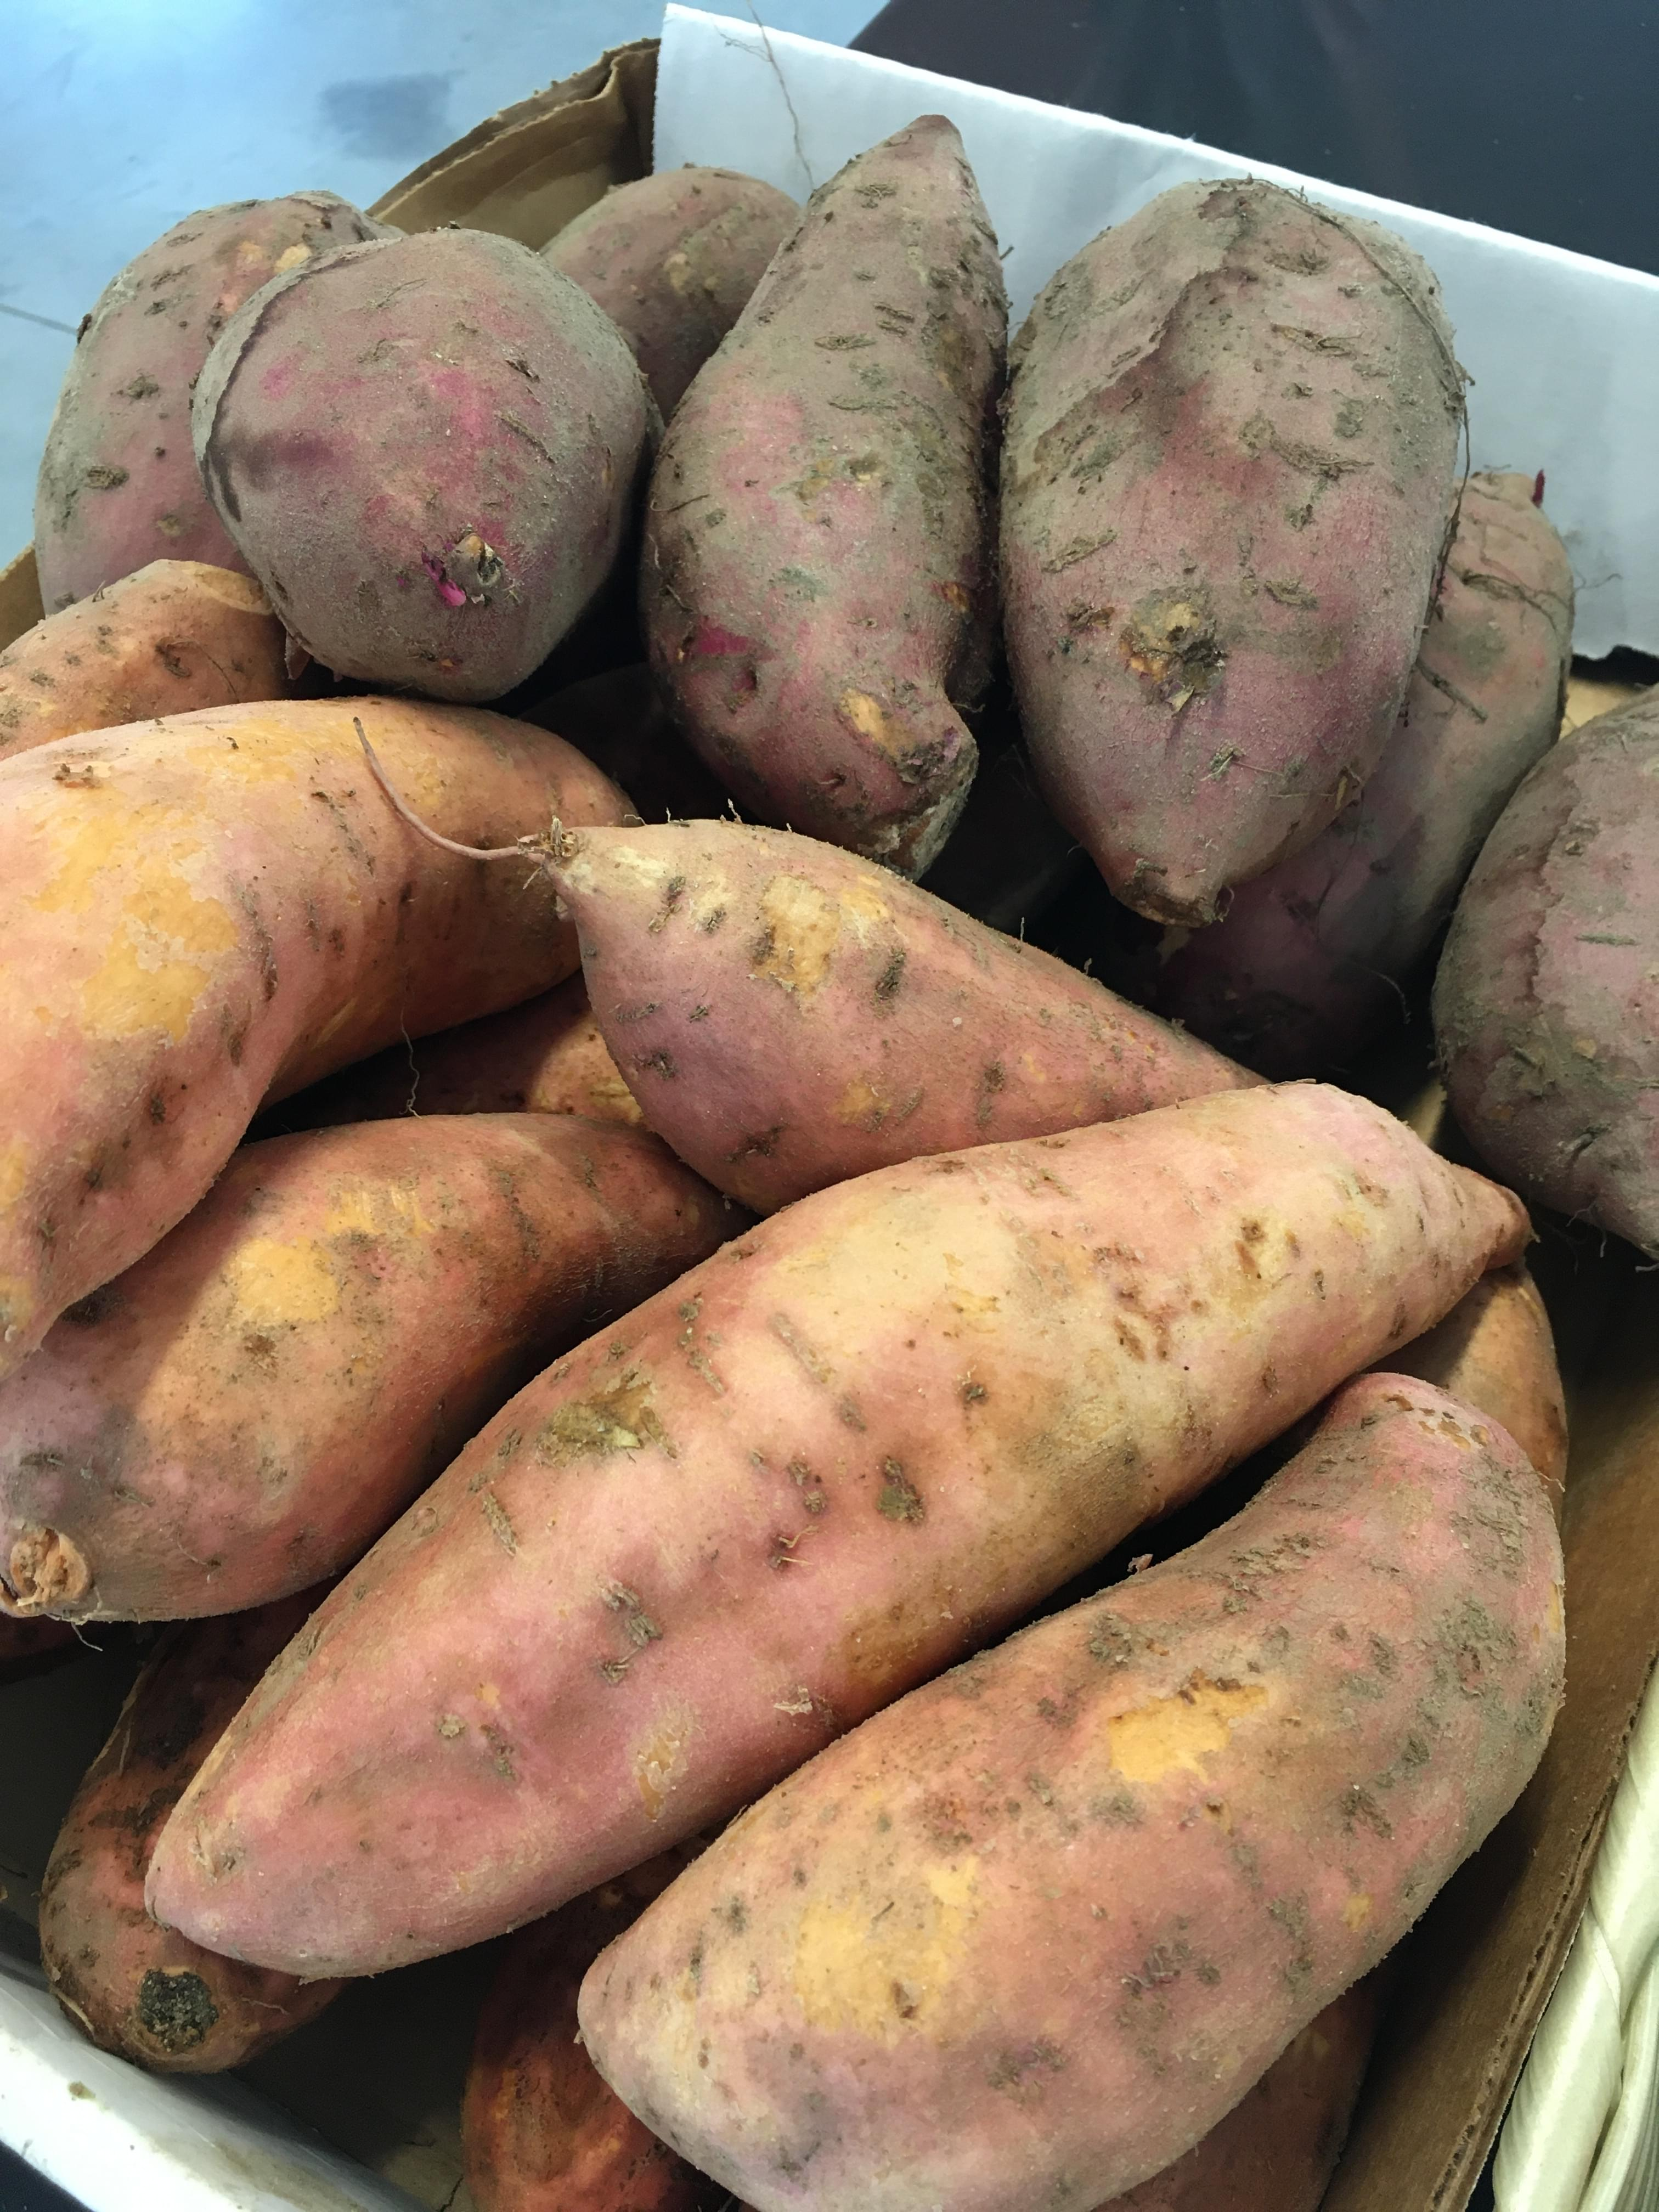 Harvest Season For Sweet Potatoes